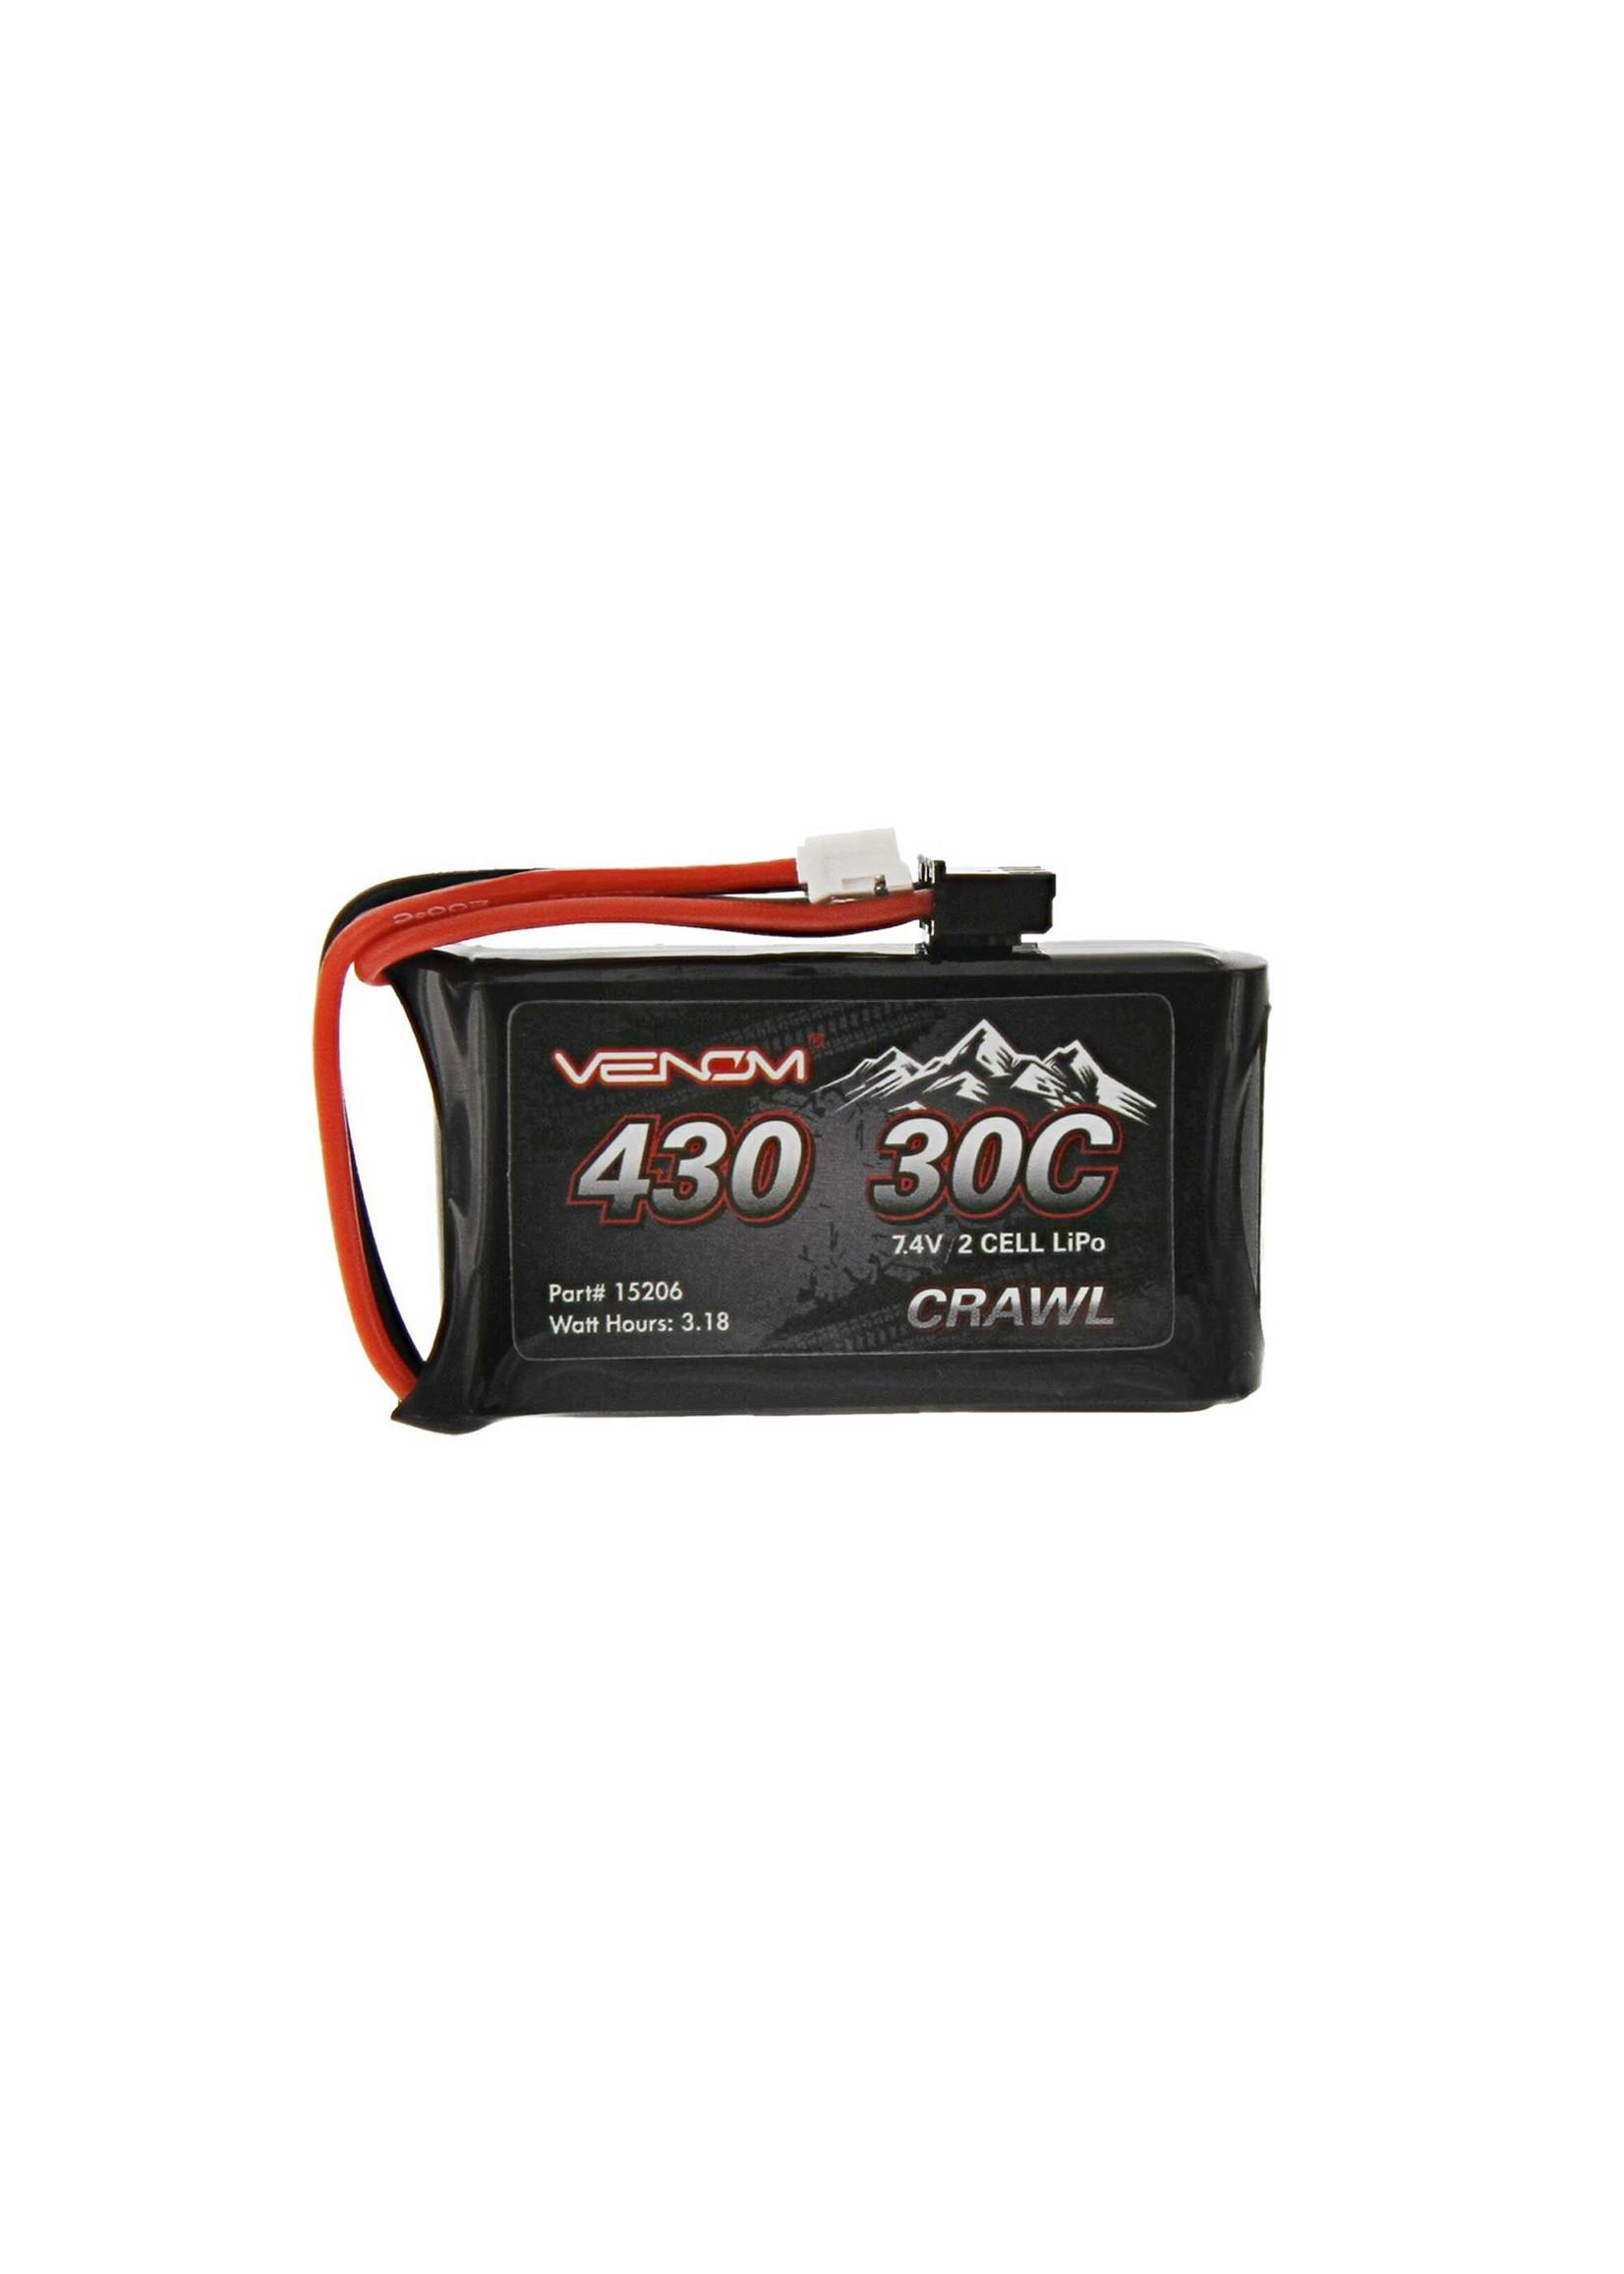 Venom VNR15206 Venom 7.4V 430mAh 2S 30C LiPo Battery JST-PH 2.0 SCX24